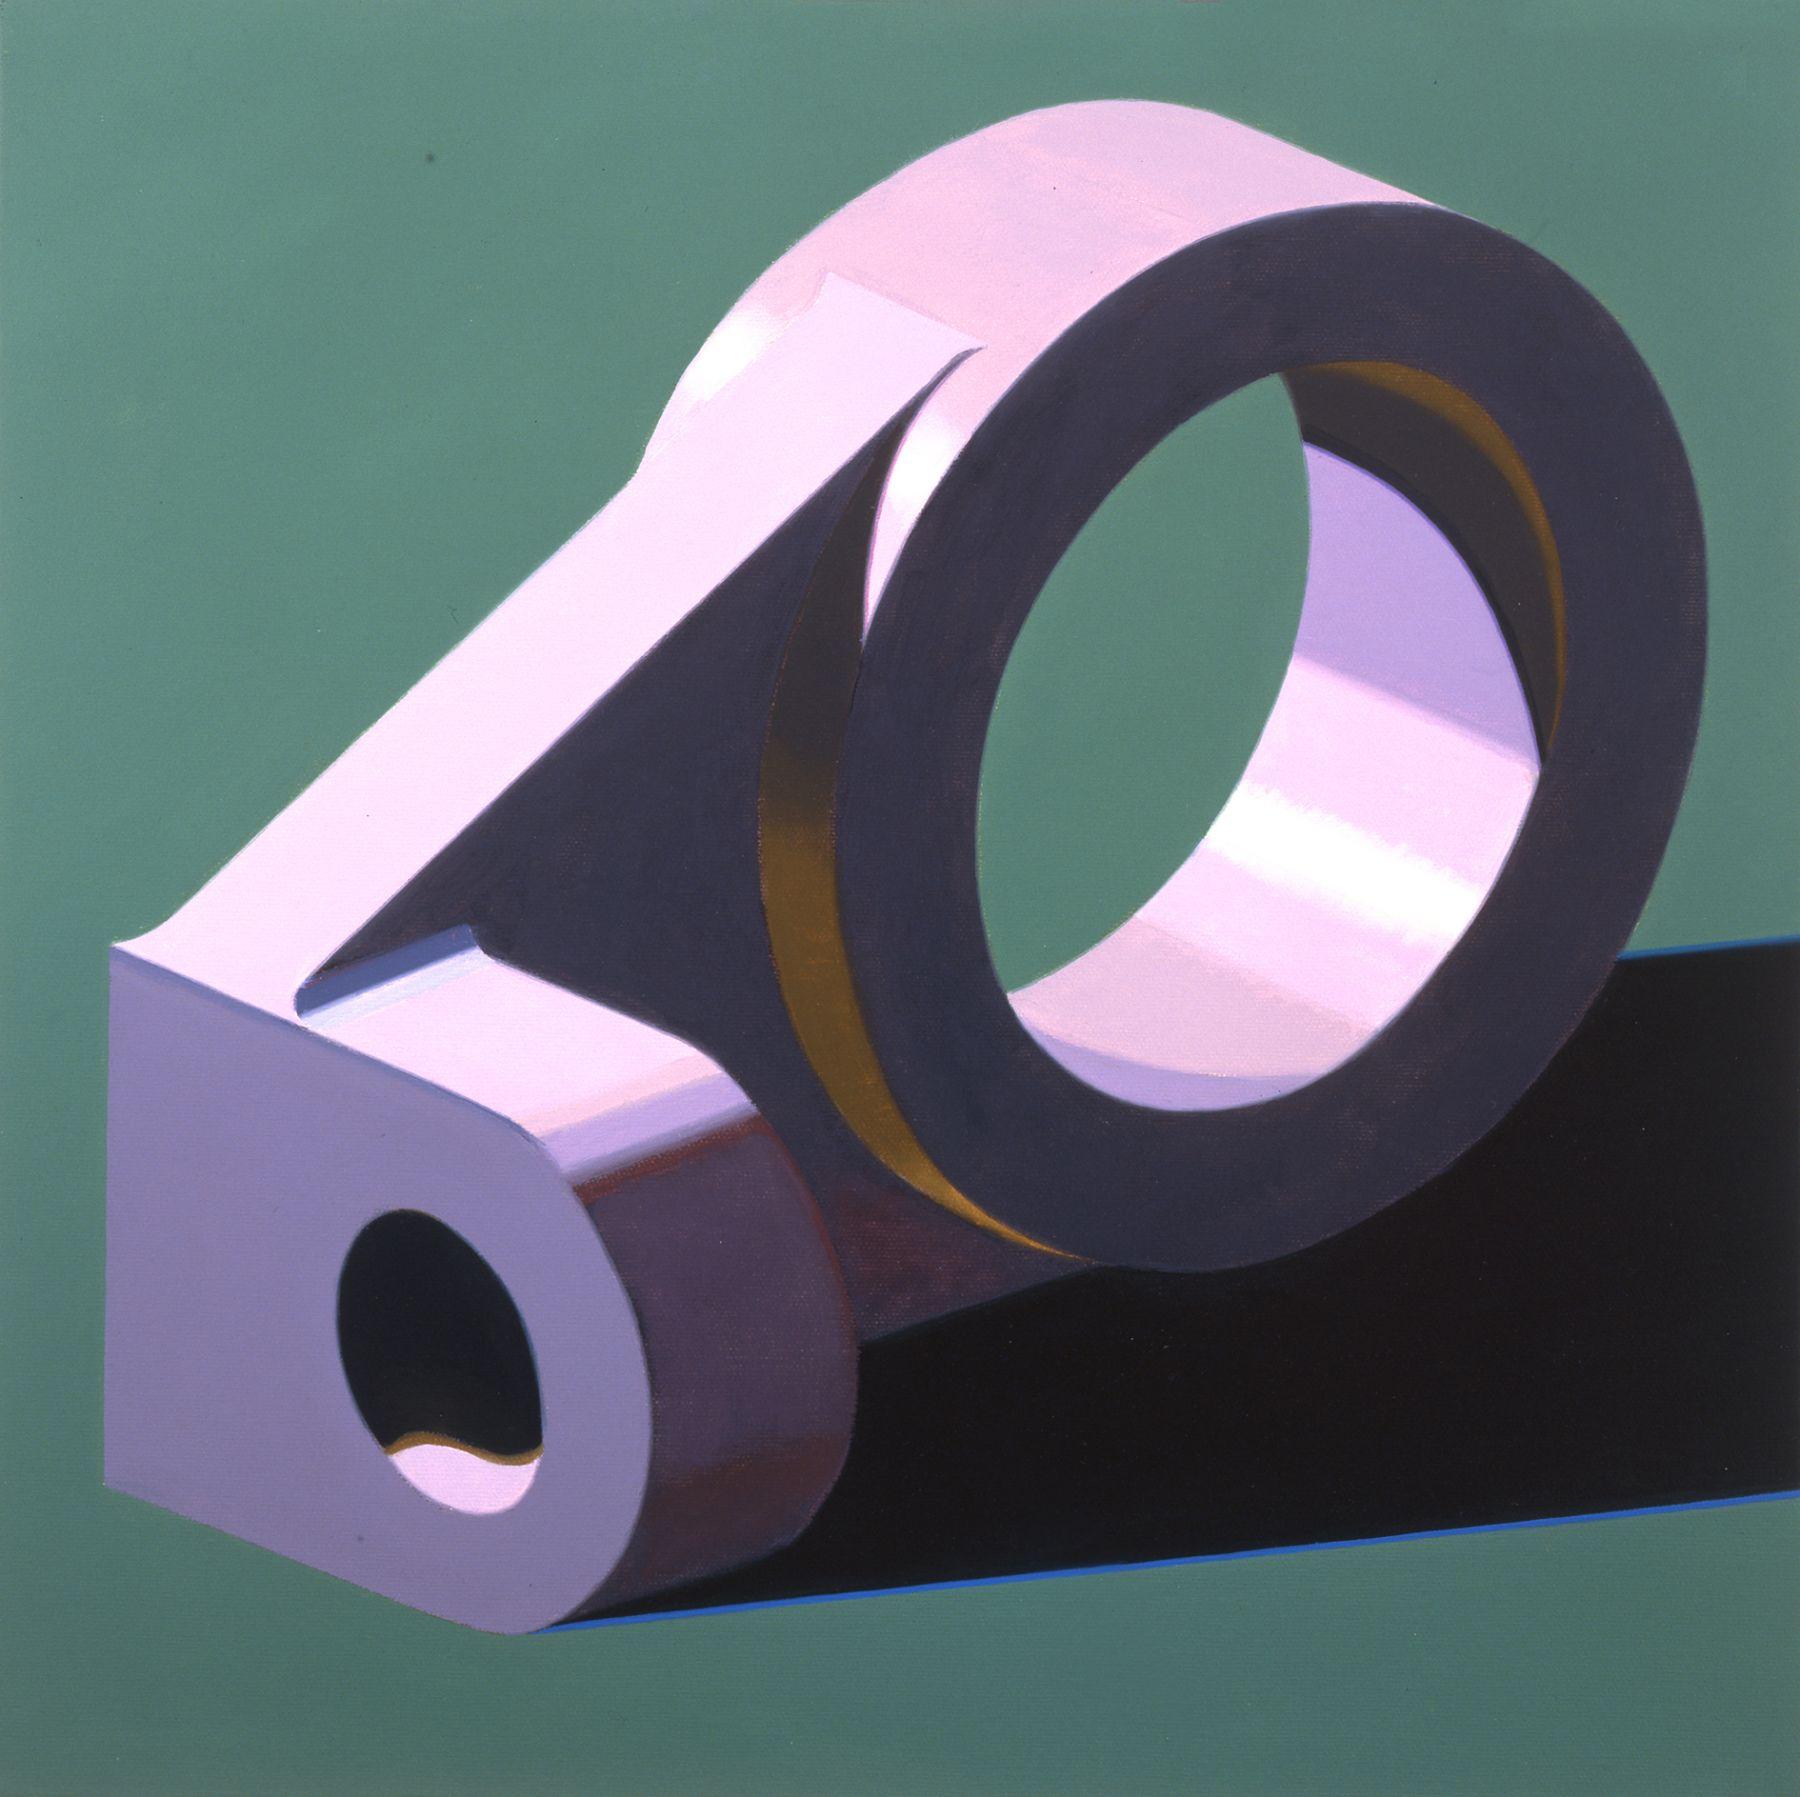 Robert Cottingham, Component IX, 2005, gouache on paper, 5 1/2 x 5 1/2 inches